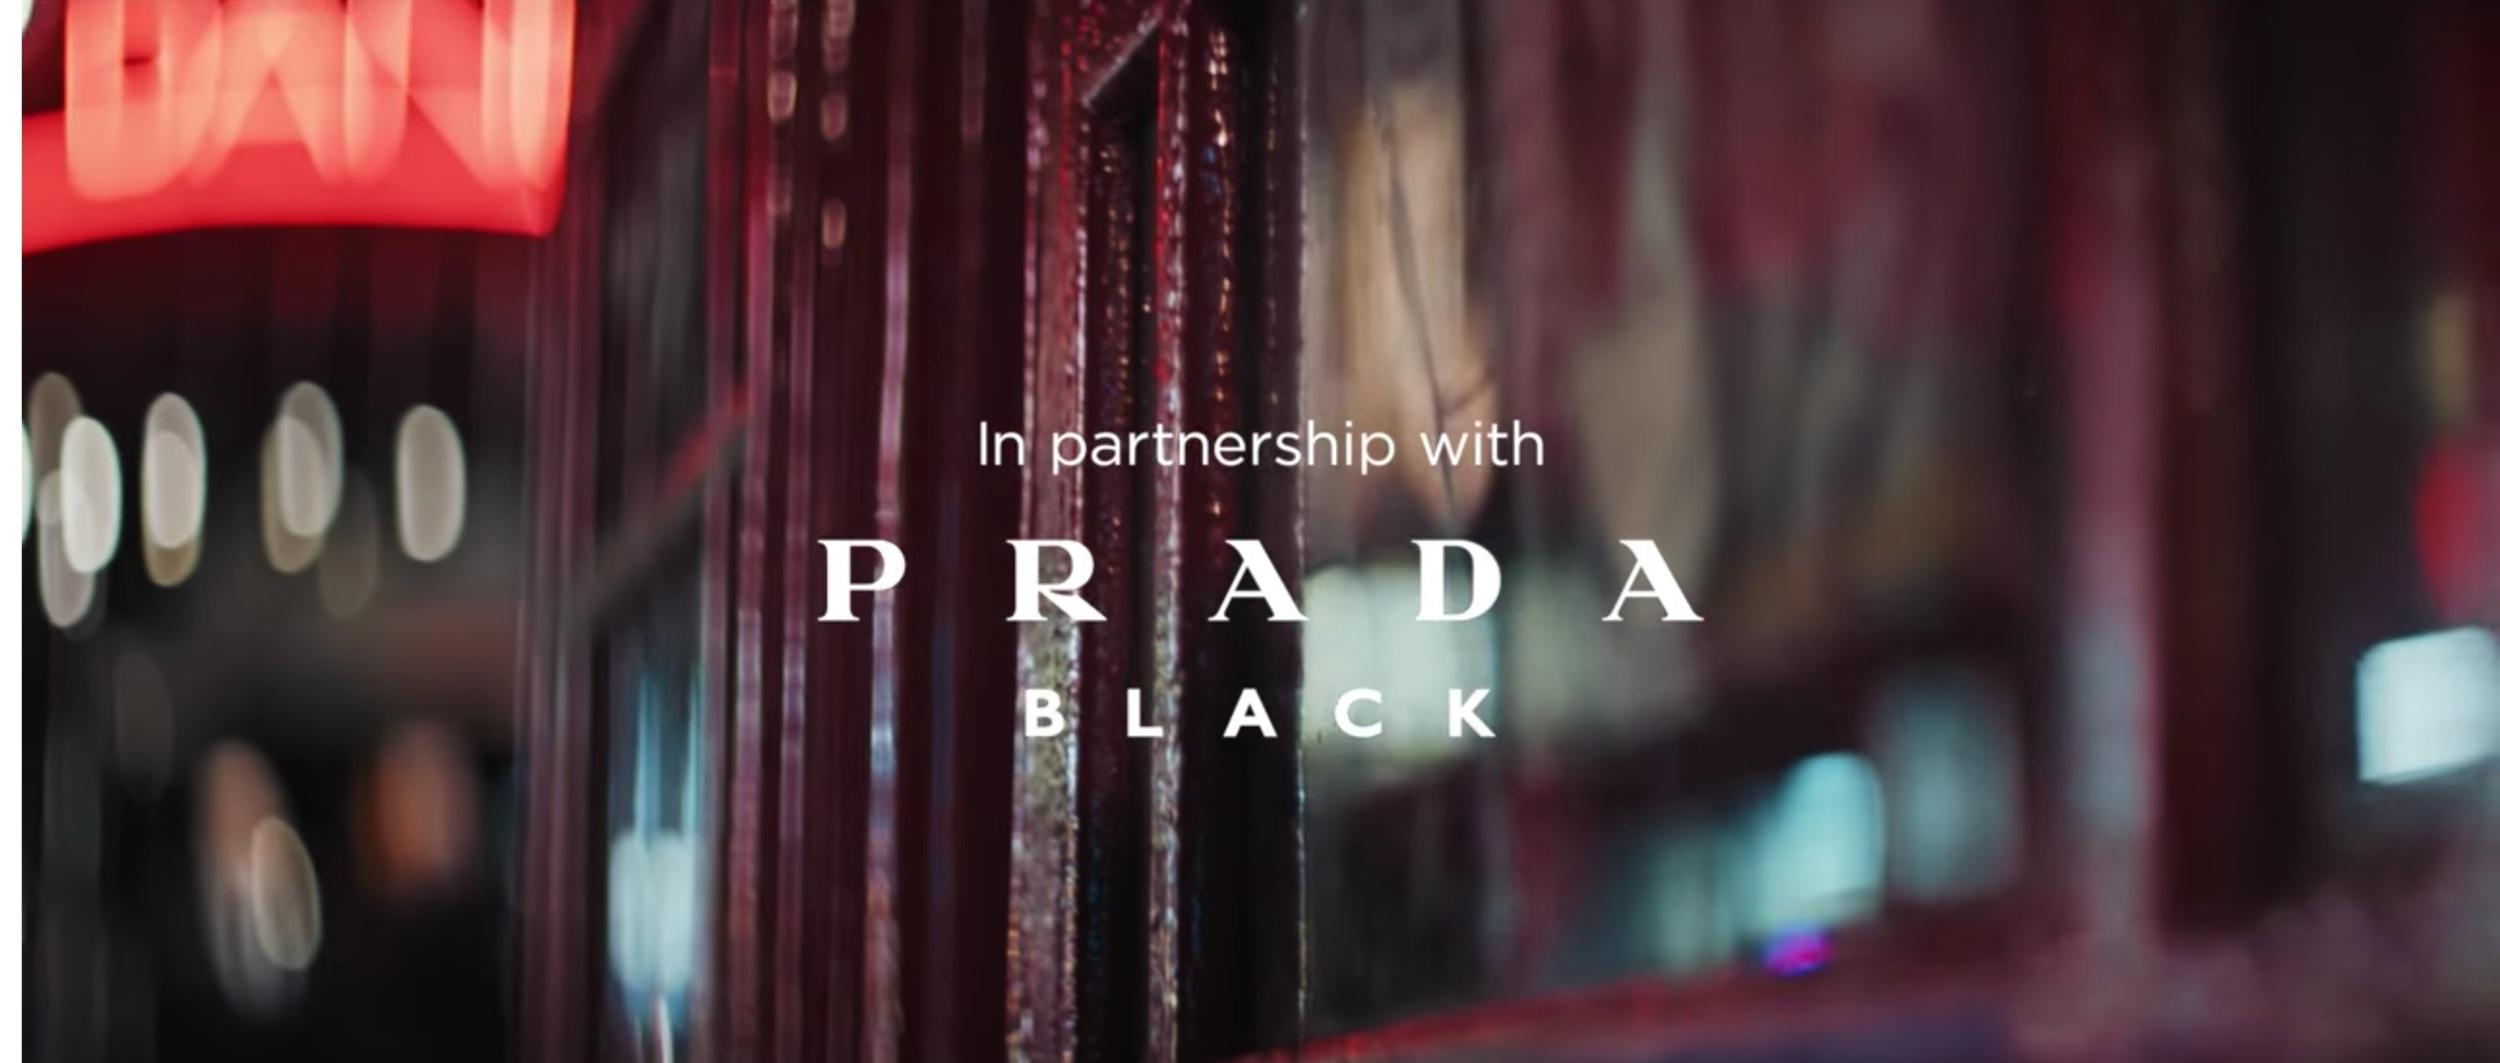 PRADa //  black  Steadicam operator   director - patrick killingbeck dop - john fisher production - gq